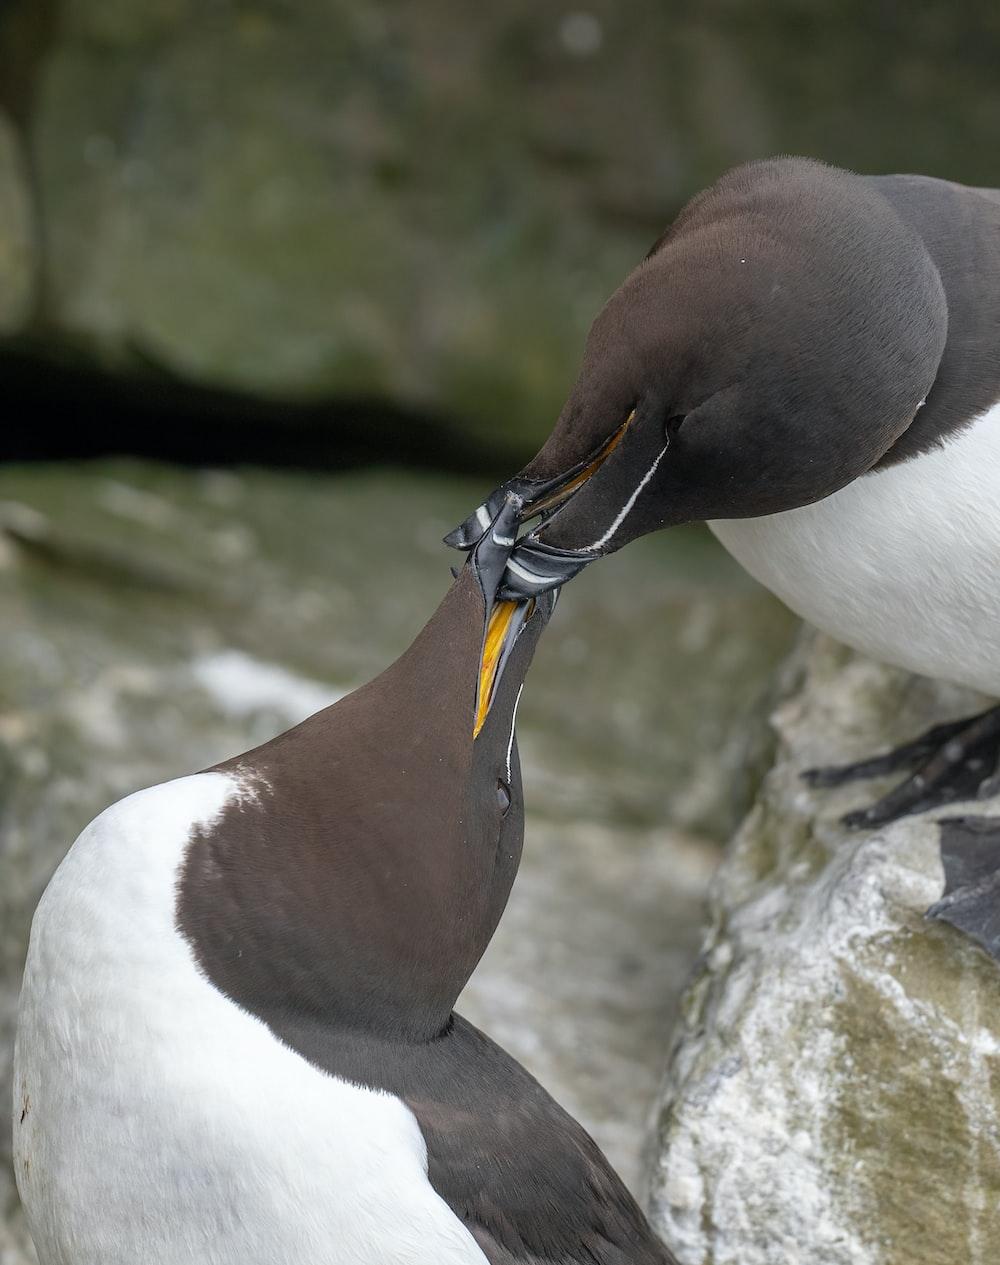 white and black bird on rock